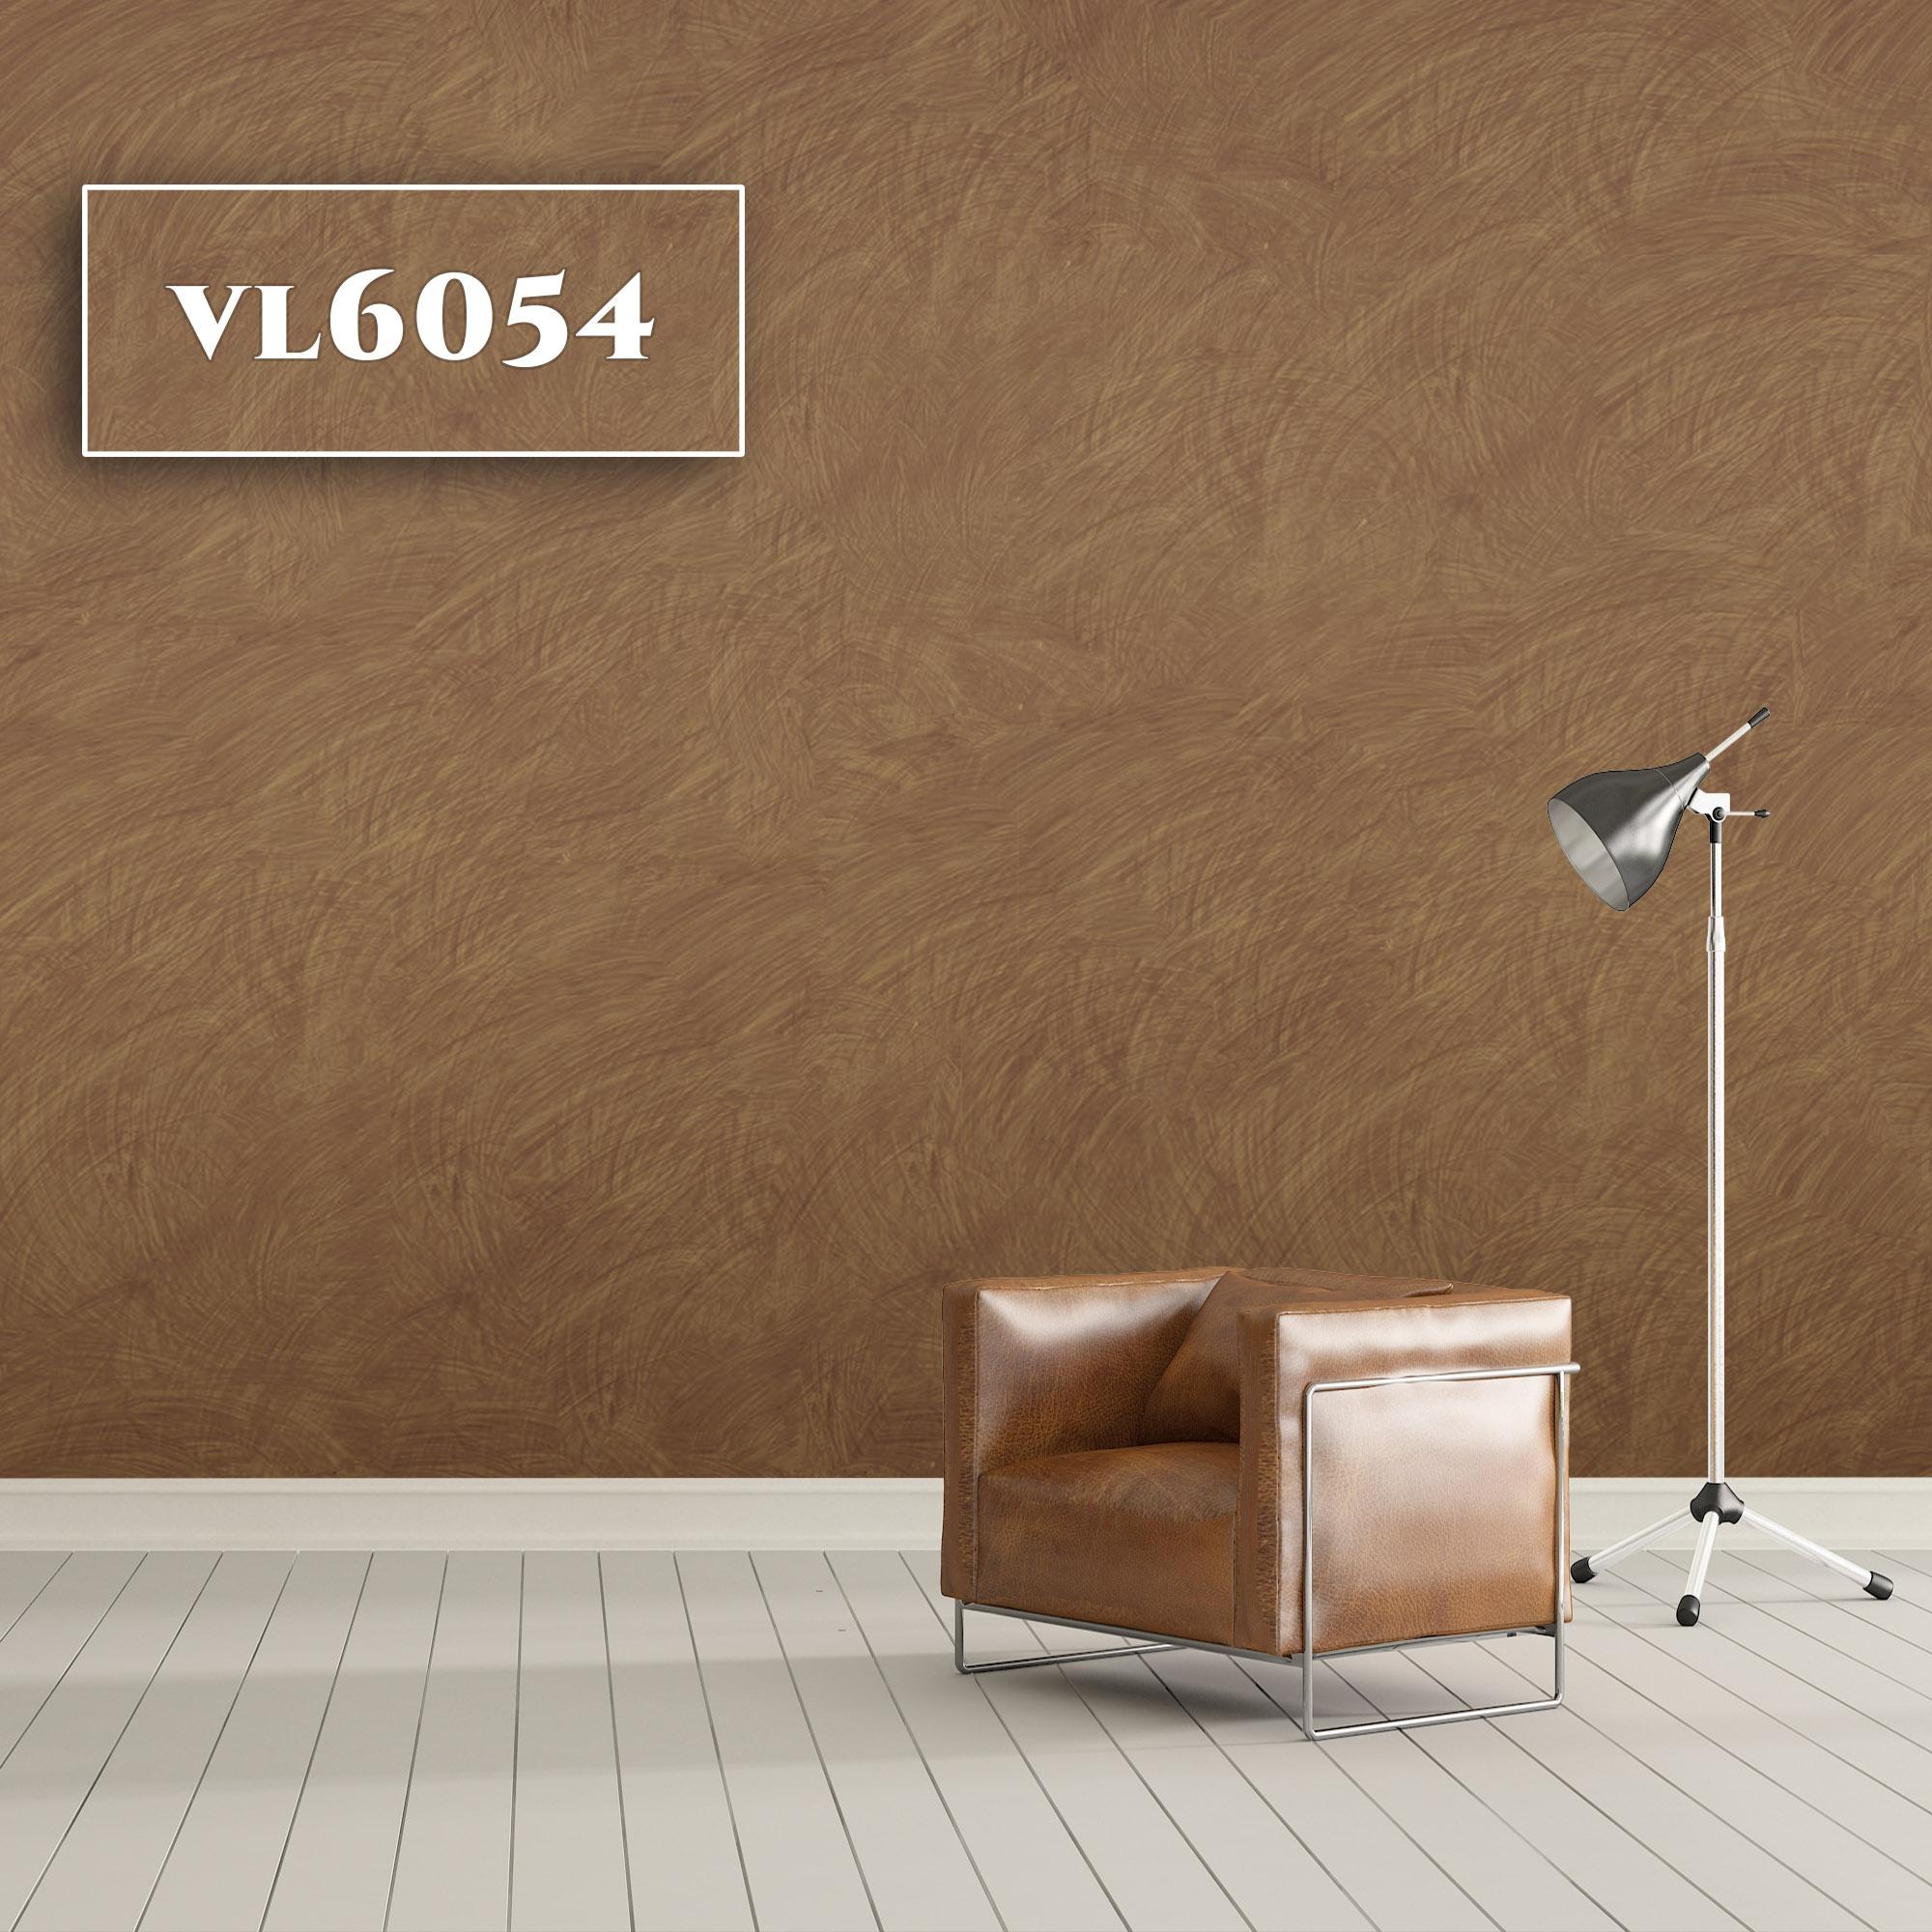 VL6054